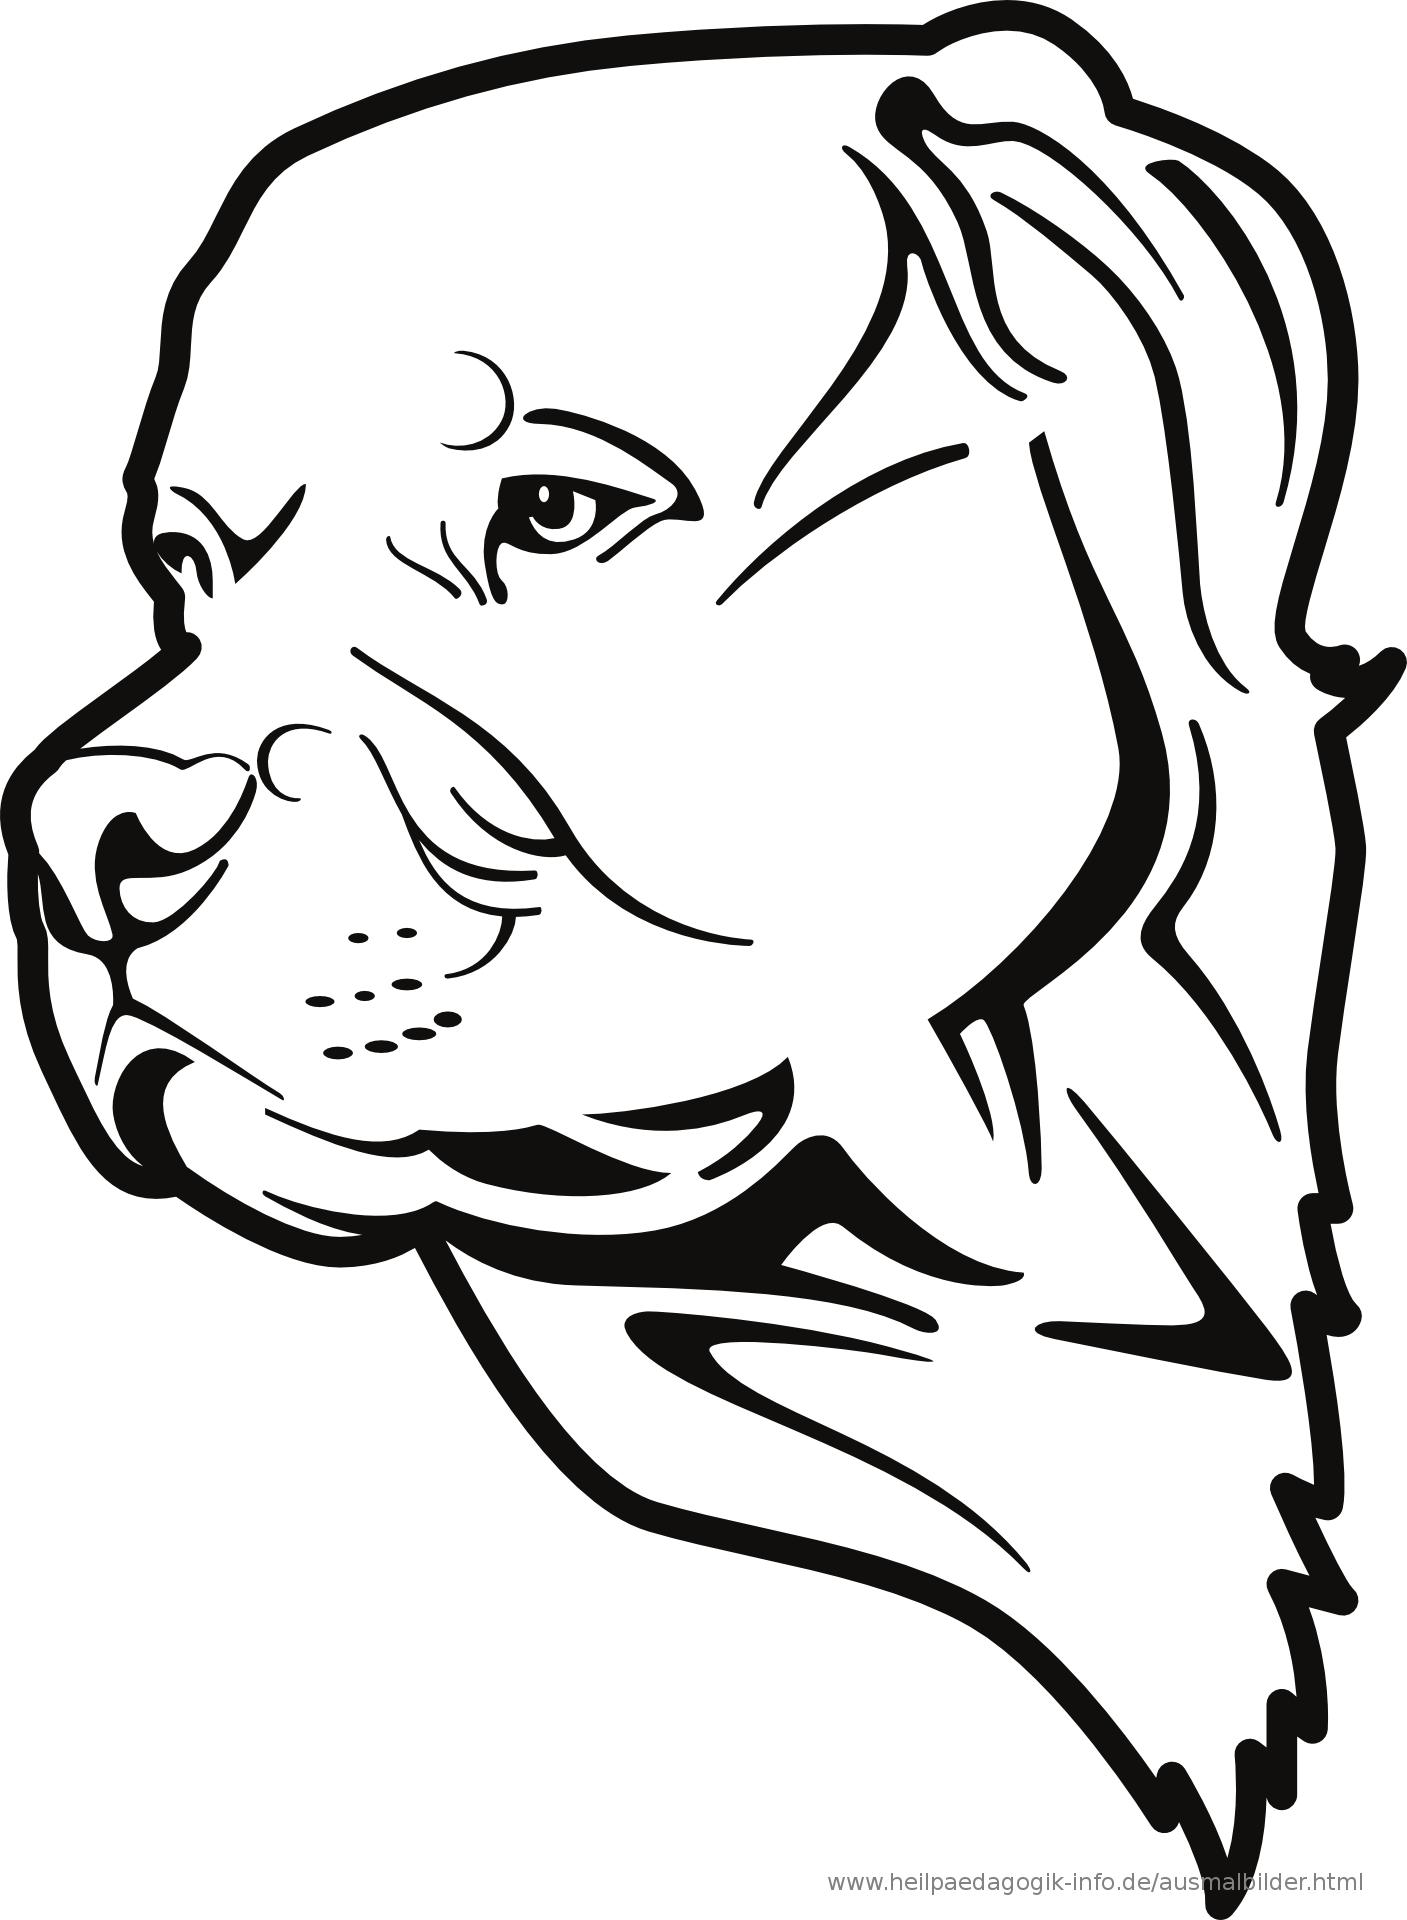 frisch malvorlagen hund malvorlagen malvorlagenfürkinder